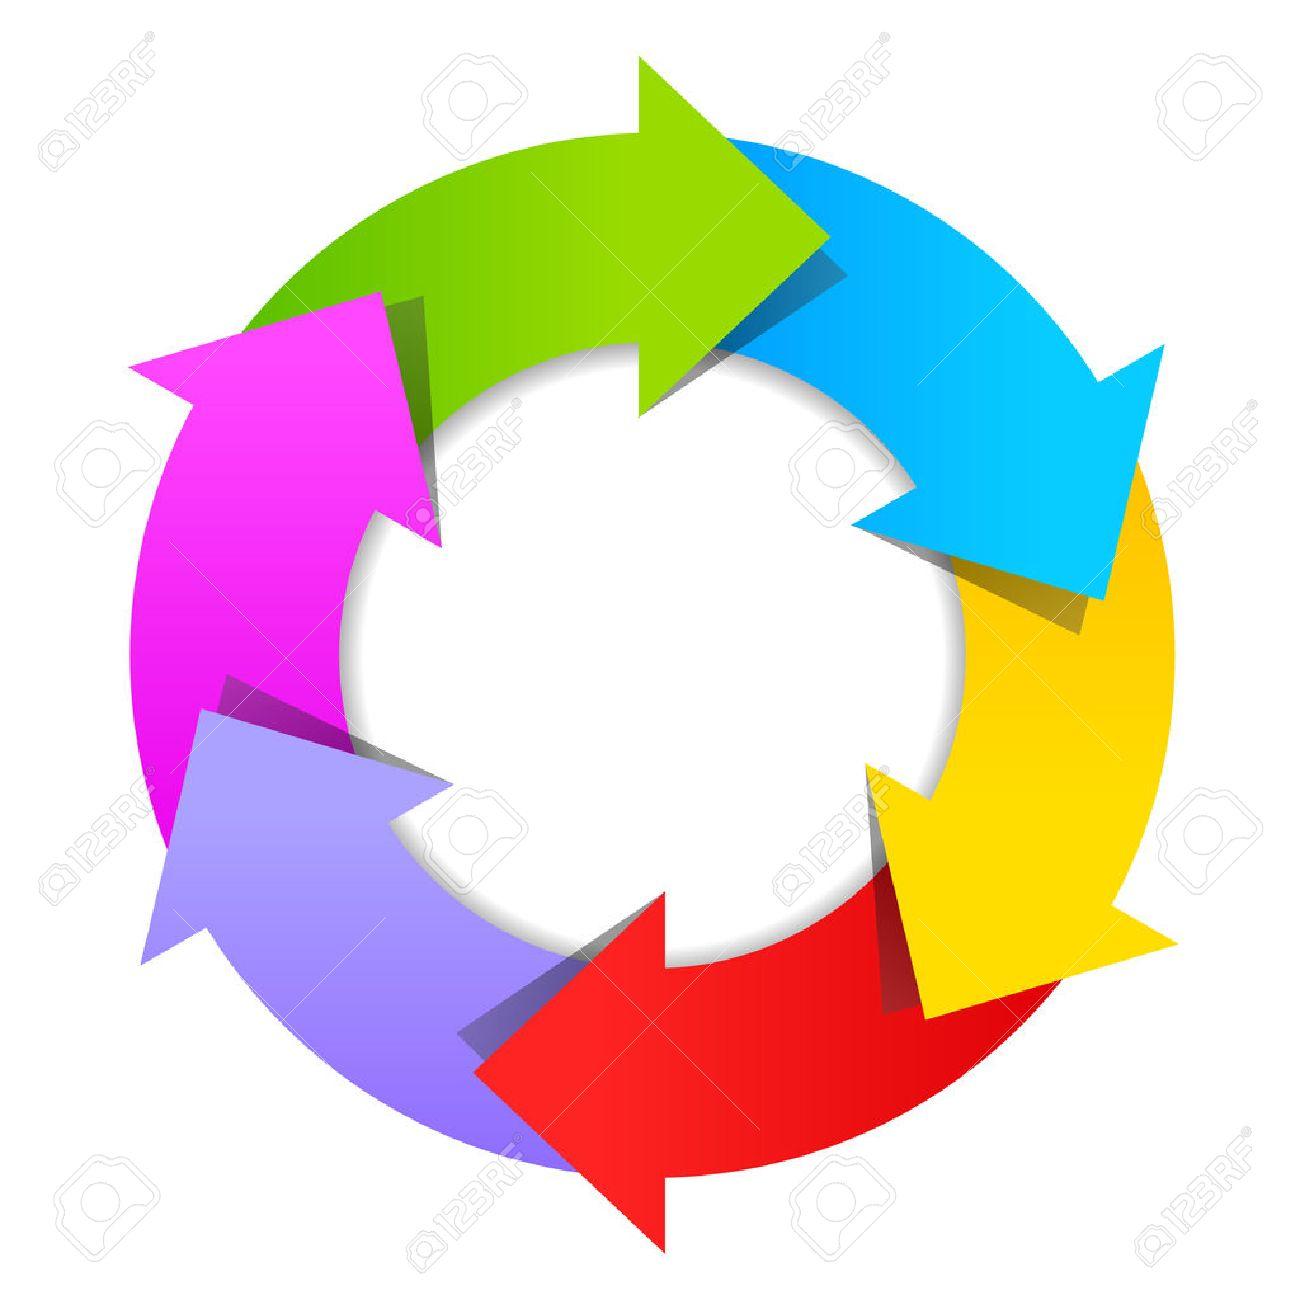 6 part arrow wheel diagram royalty free cliparts vectors and stock 6 part arrow wheel diagram stock vector 43262588 ccuart Choice Image